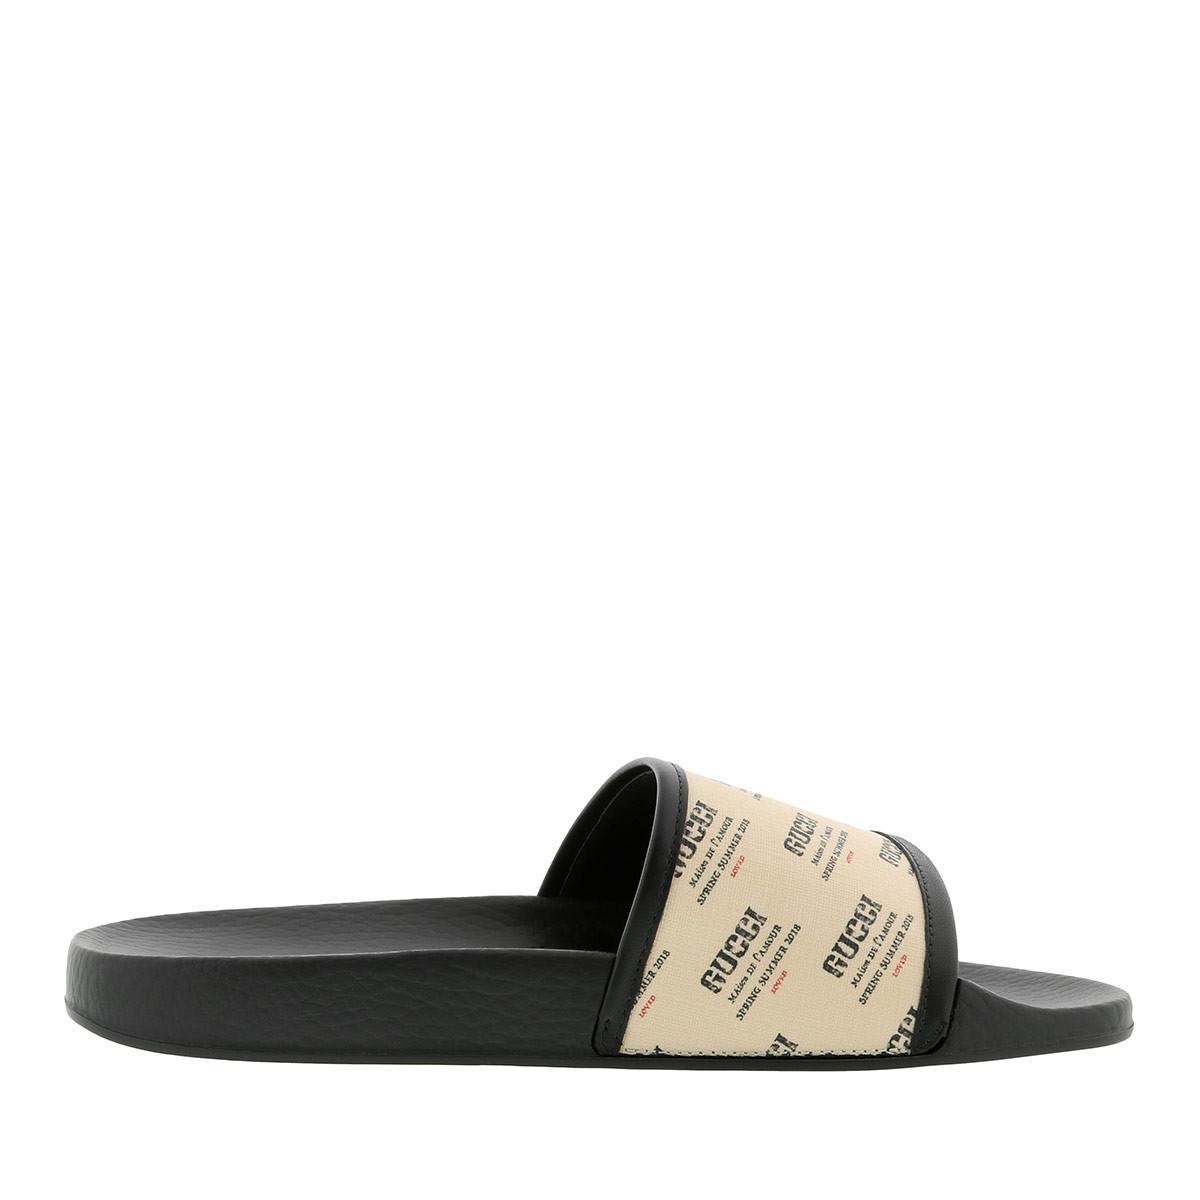 73badacf8eb Gucci - GG Supreme Slide Sandals White black - Lyst. View fullscreen